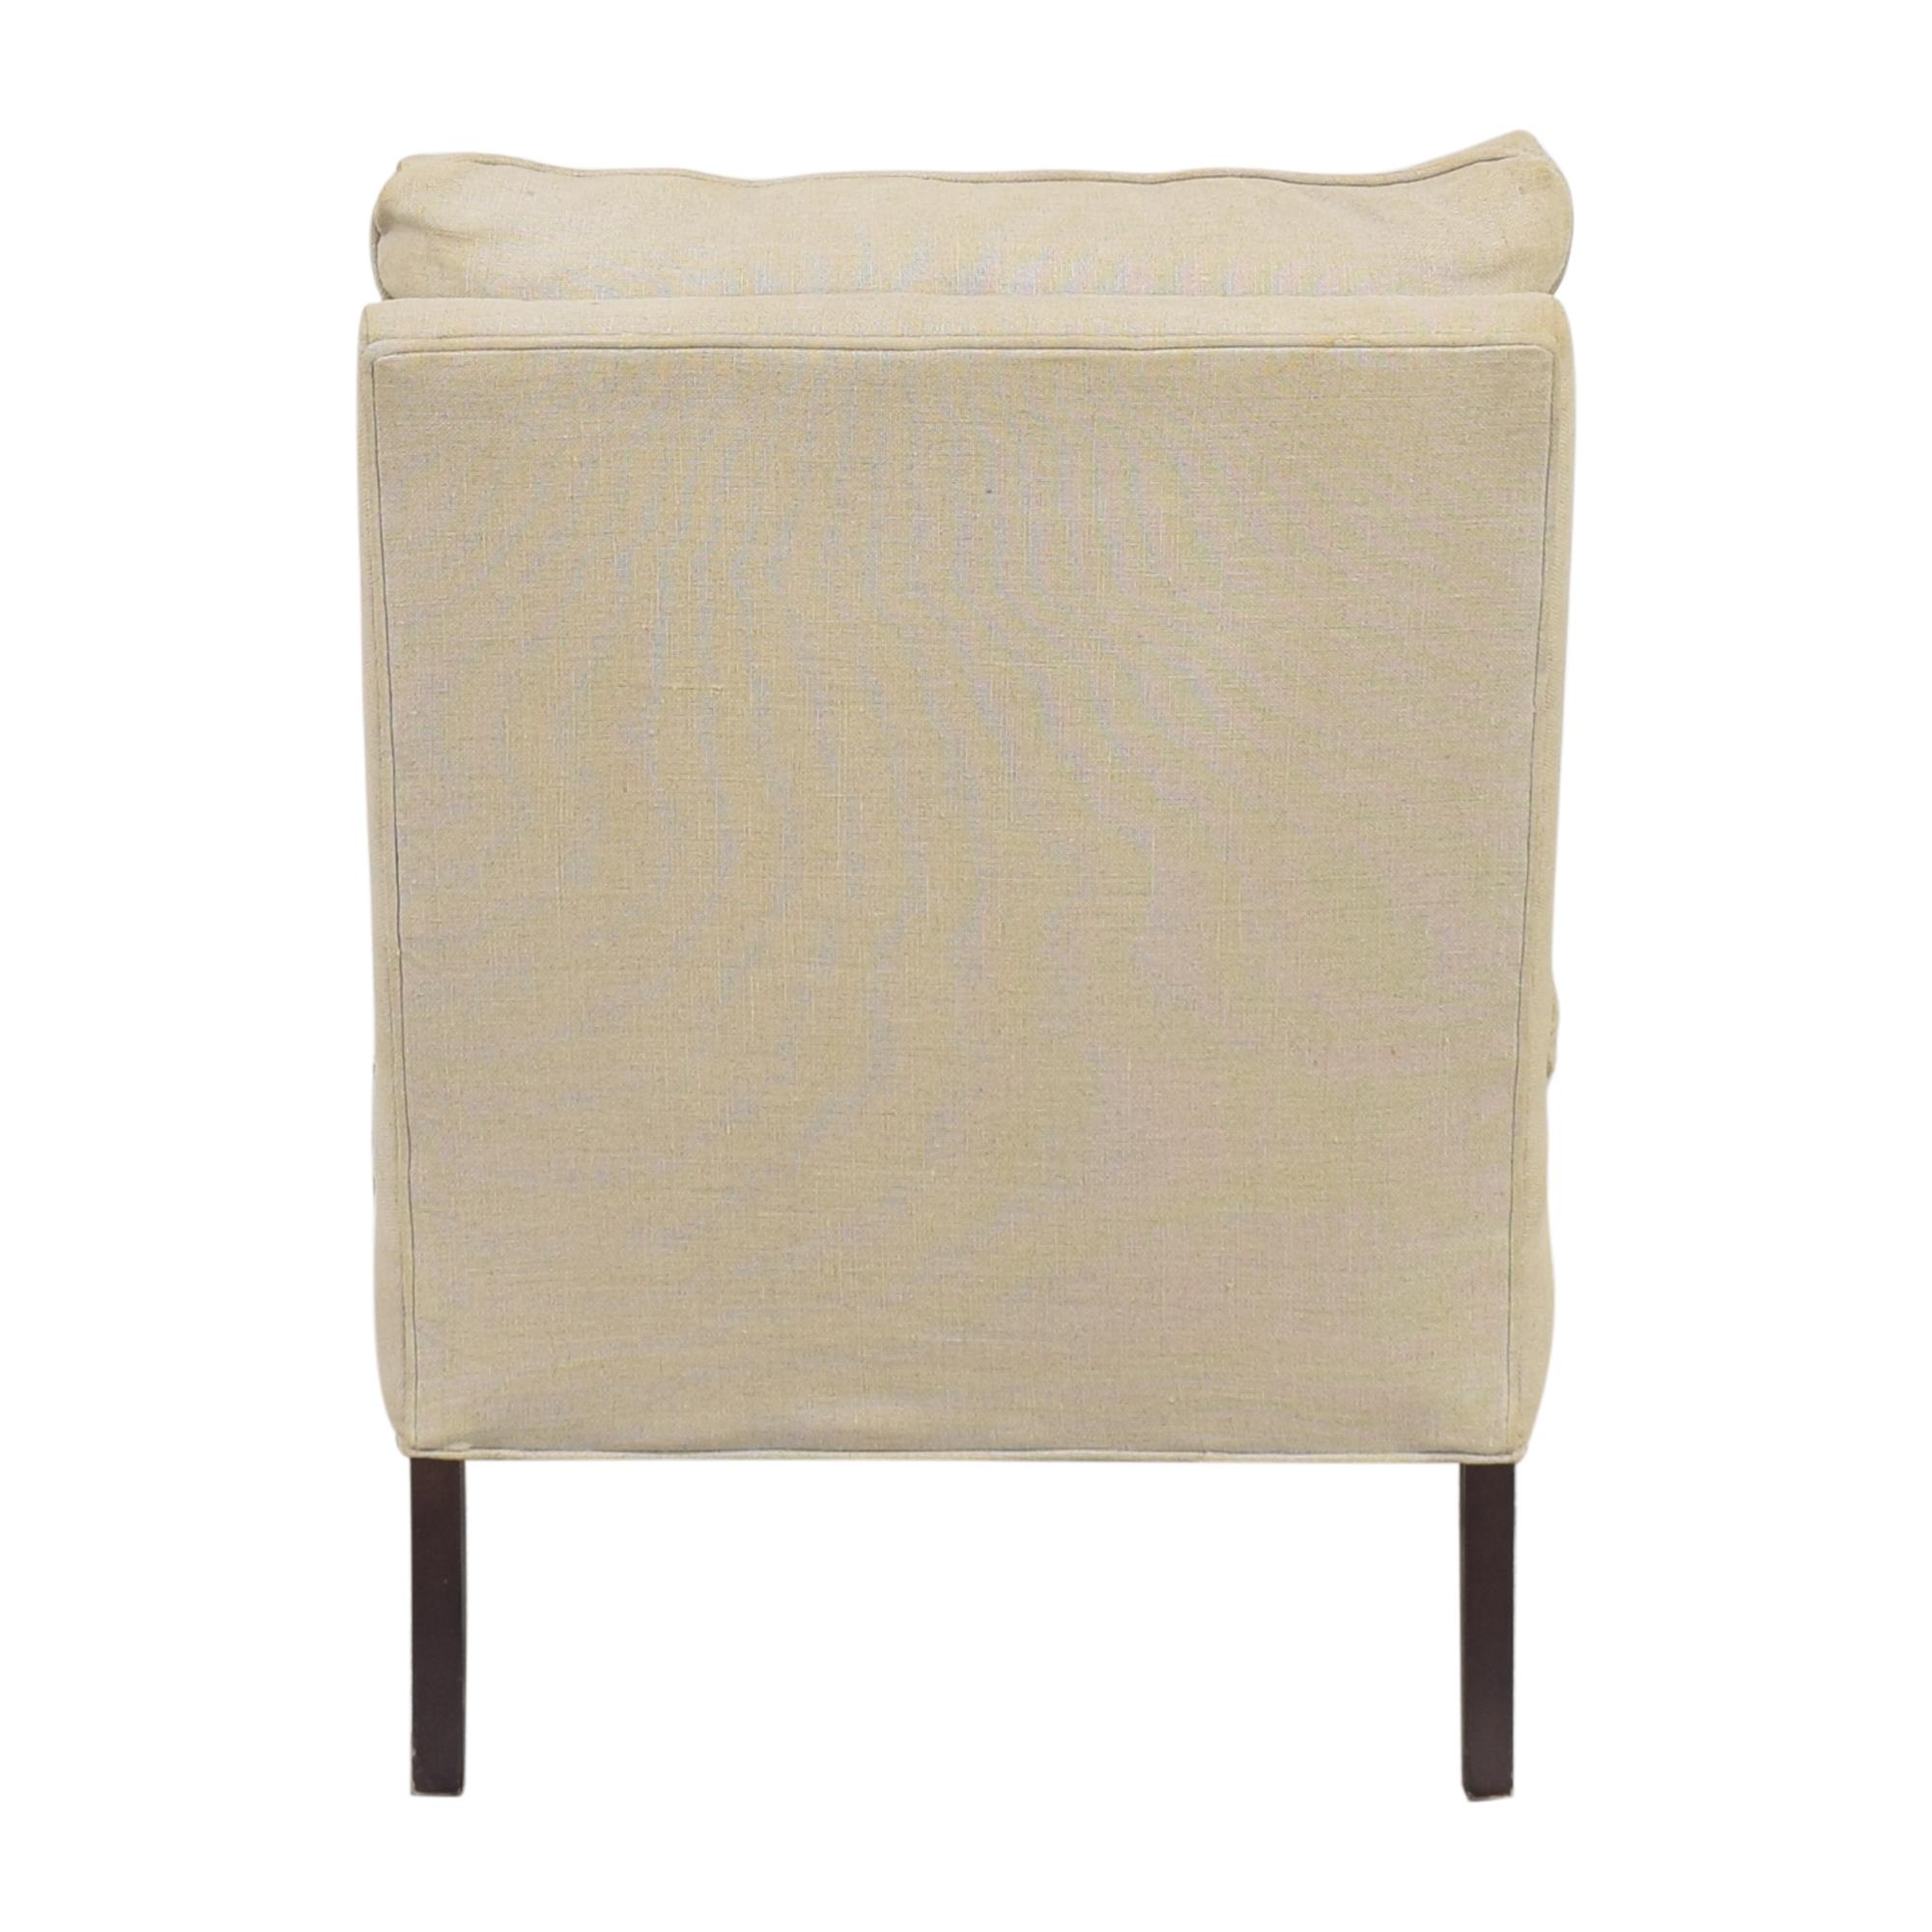 Mitchell Gold + Bob Williams Slipper Chair / Chairs